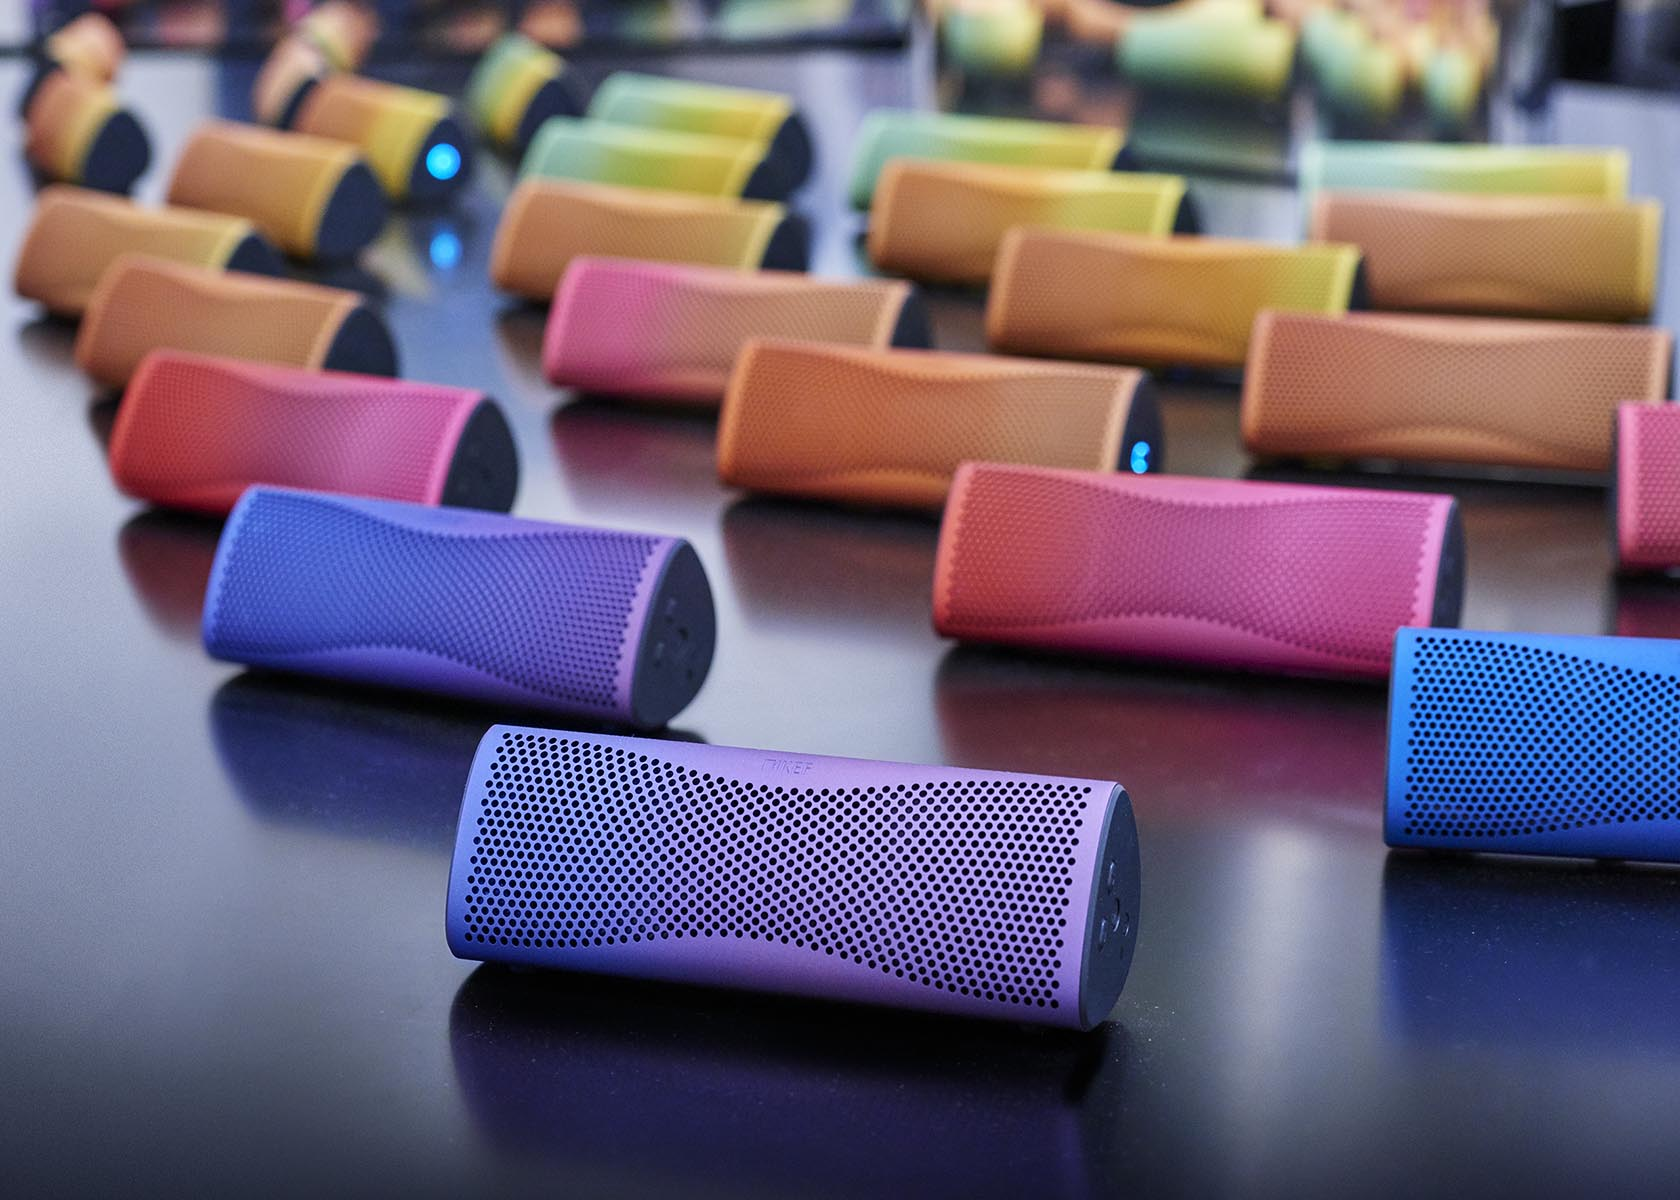 kef-muo-speaker-ross-lovegrove-computational-design-andrea-locatelli-15.jpg